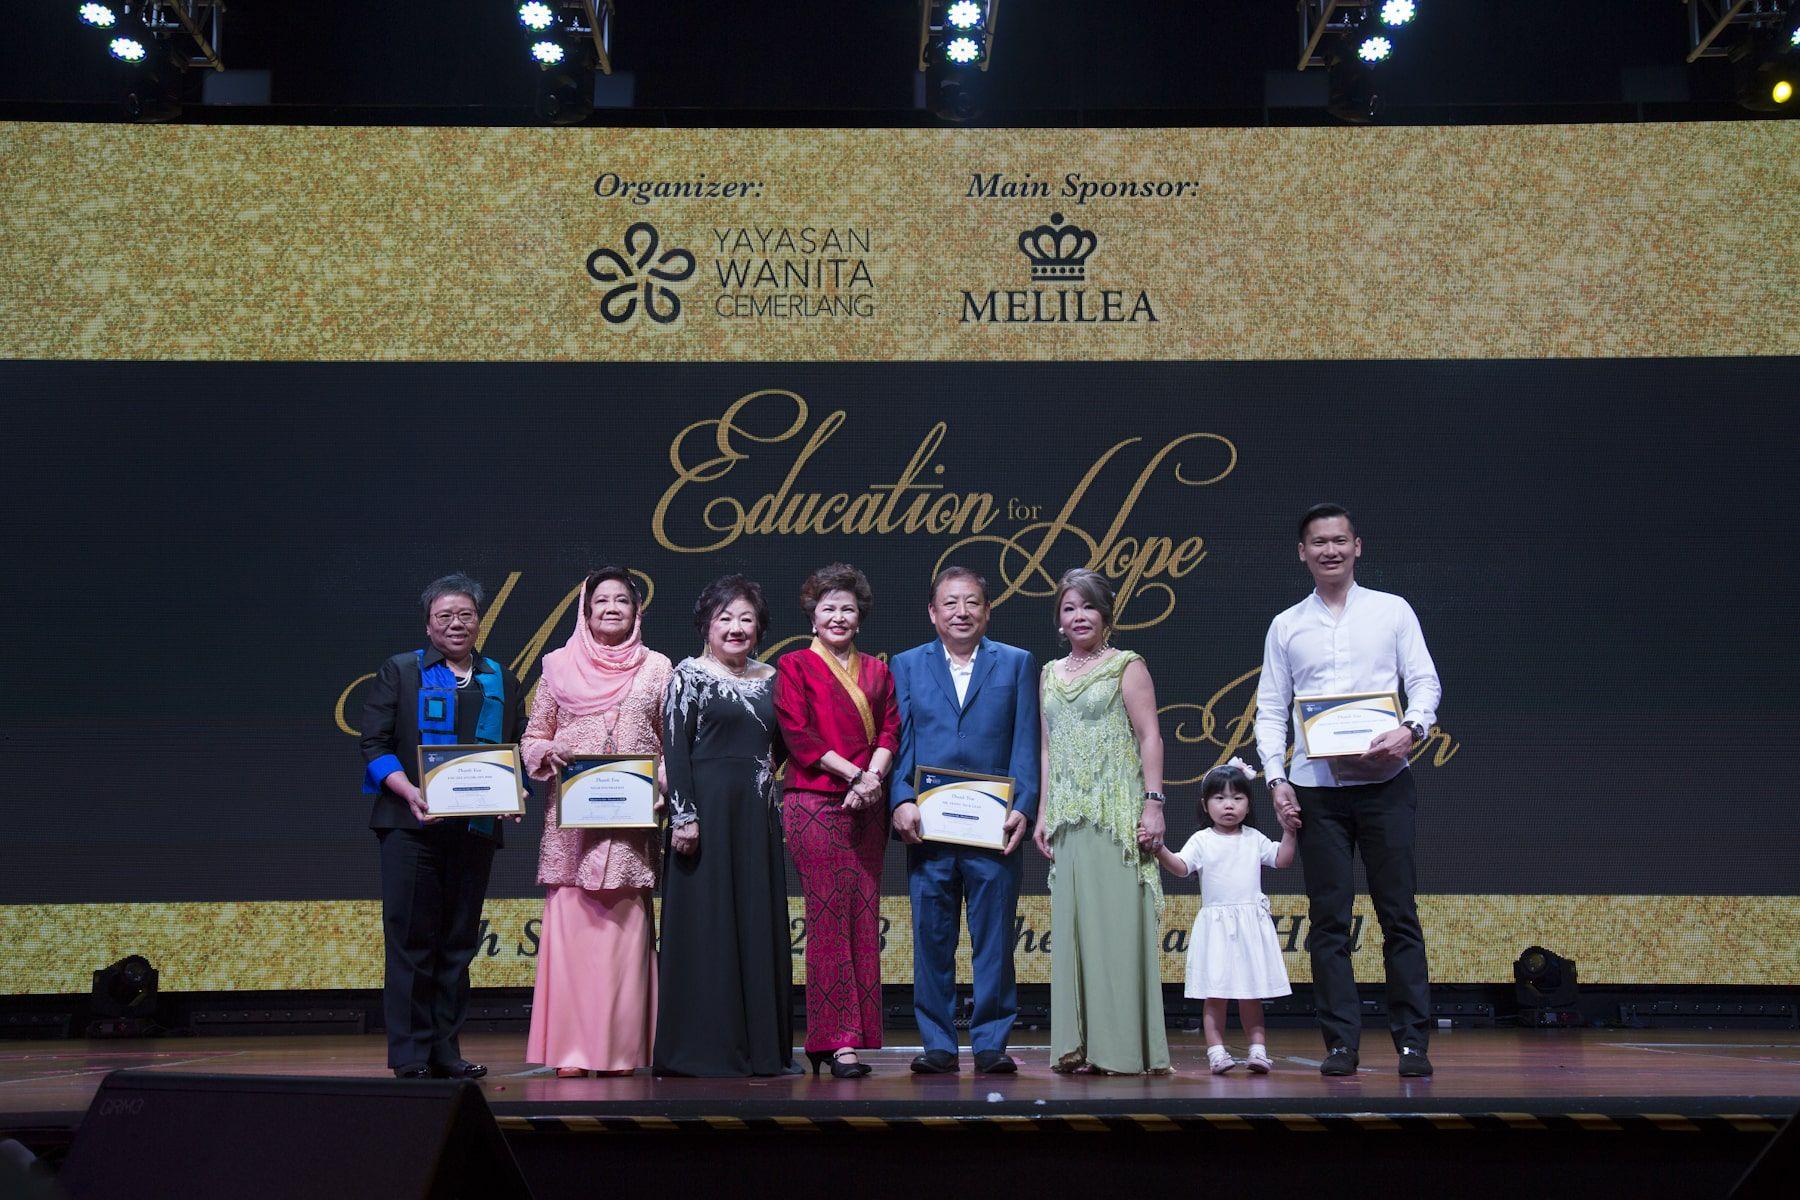 Beh Swan Swan from ENE Selangor, Datin Paduka Dr Faridah Abdullah, Datin Rosalind Lee, Tan Sri Dato' Sri Dr Ng Yen Yen, Teong Teck Lean from GDex, Dato' Dr Stella Chin and Dato' Eng Yee Koon